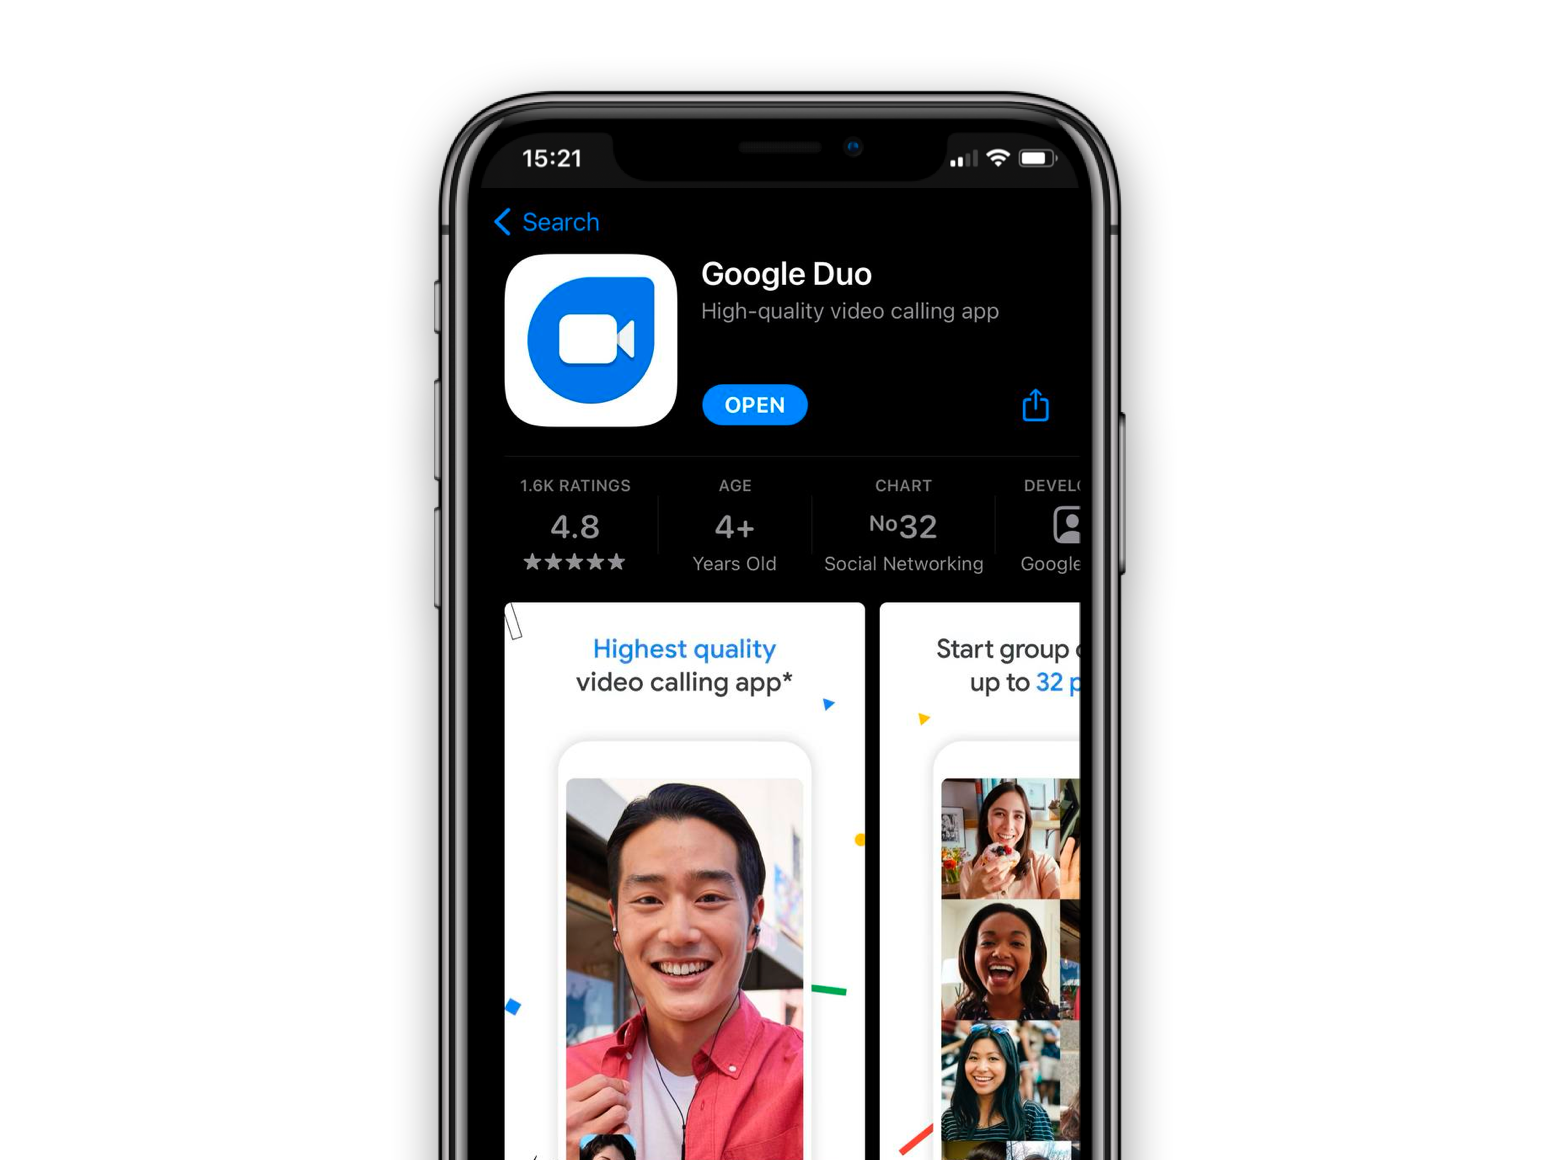 google-duo-on-iphone